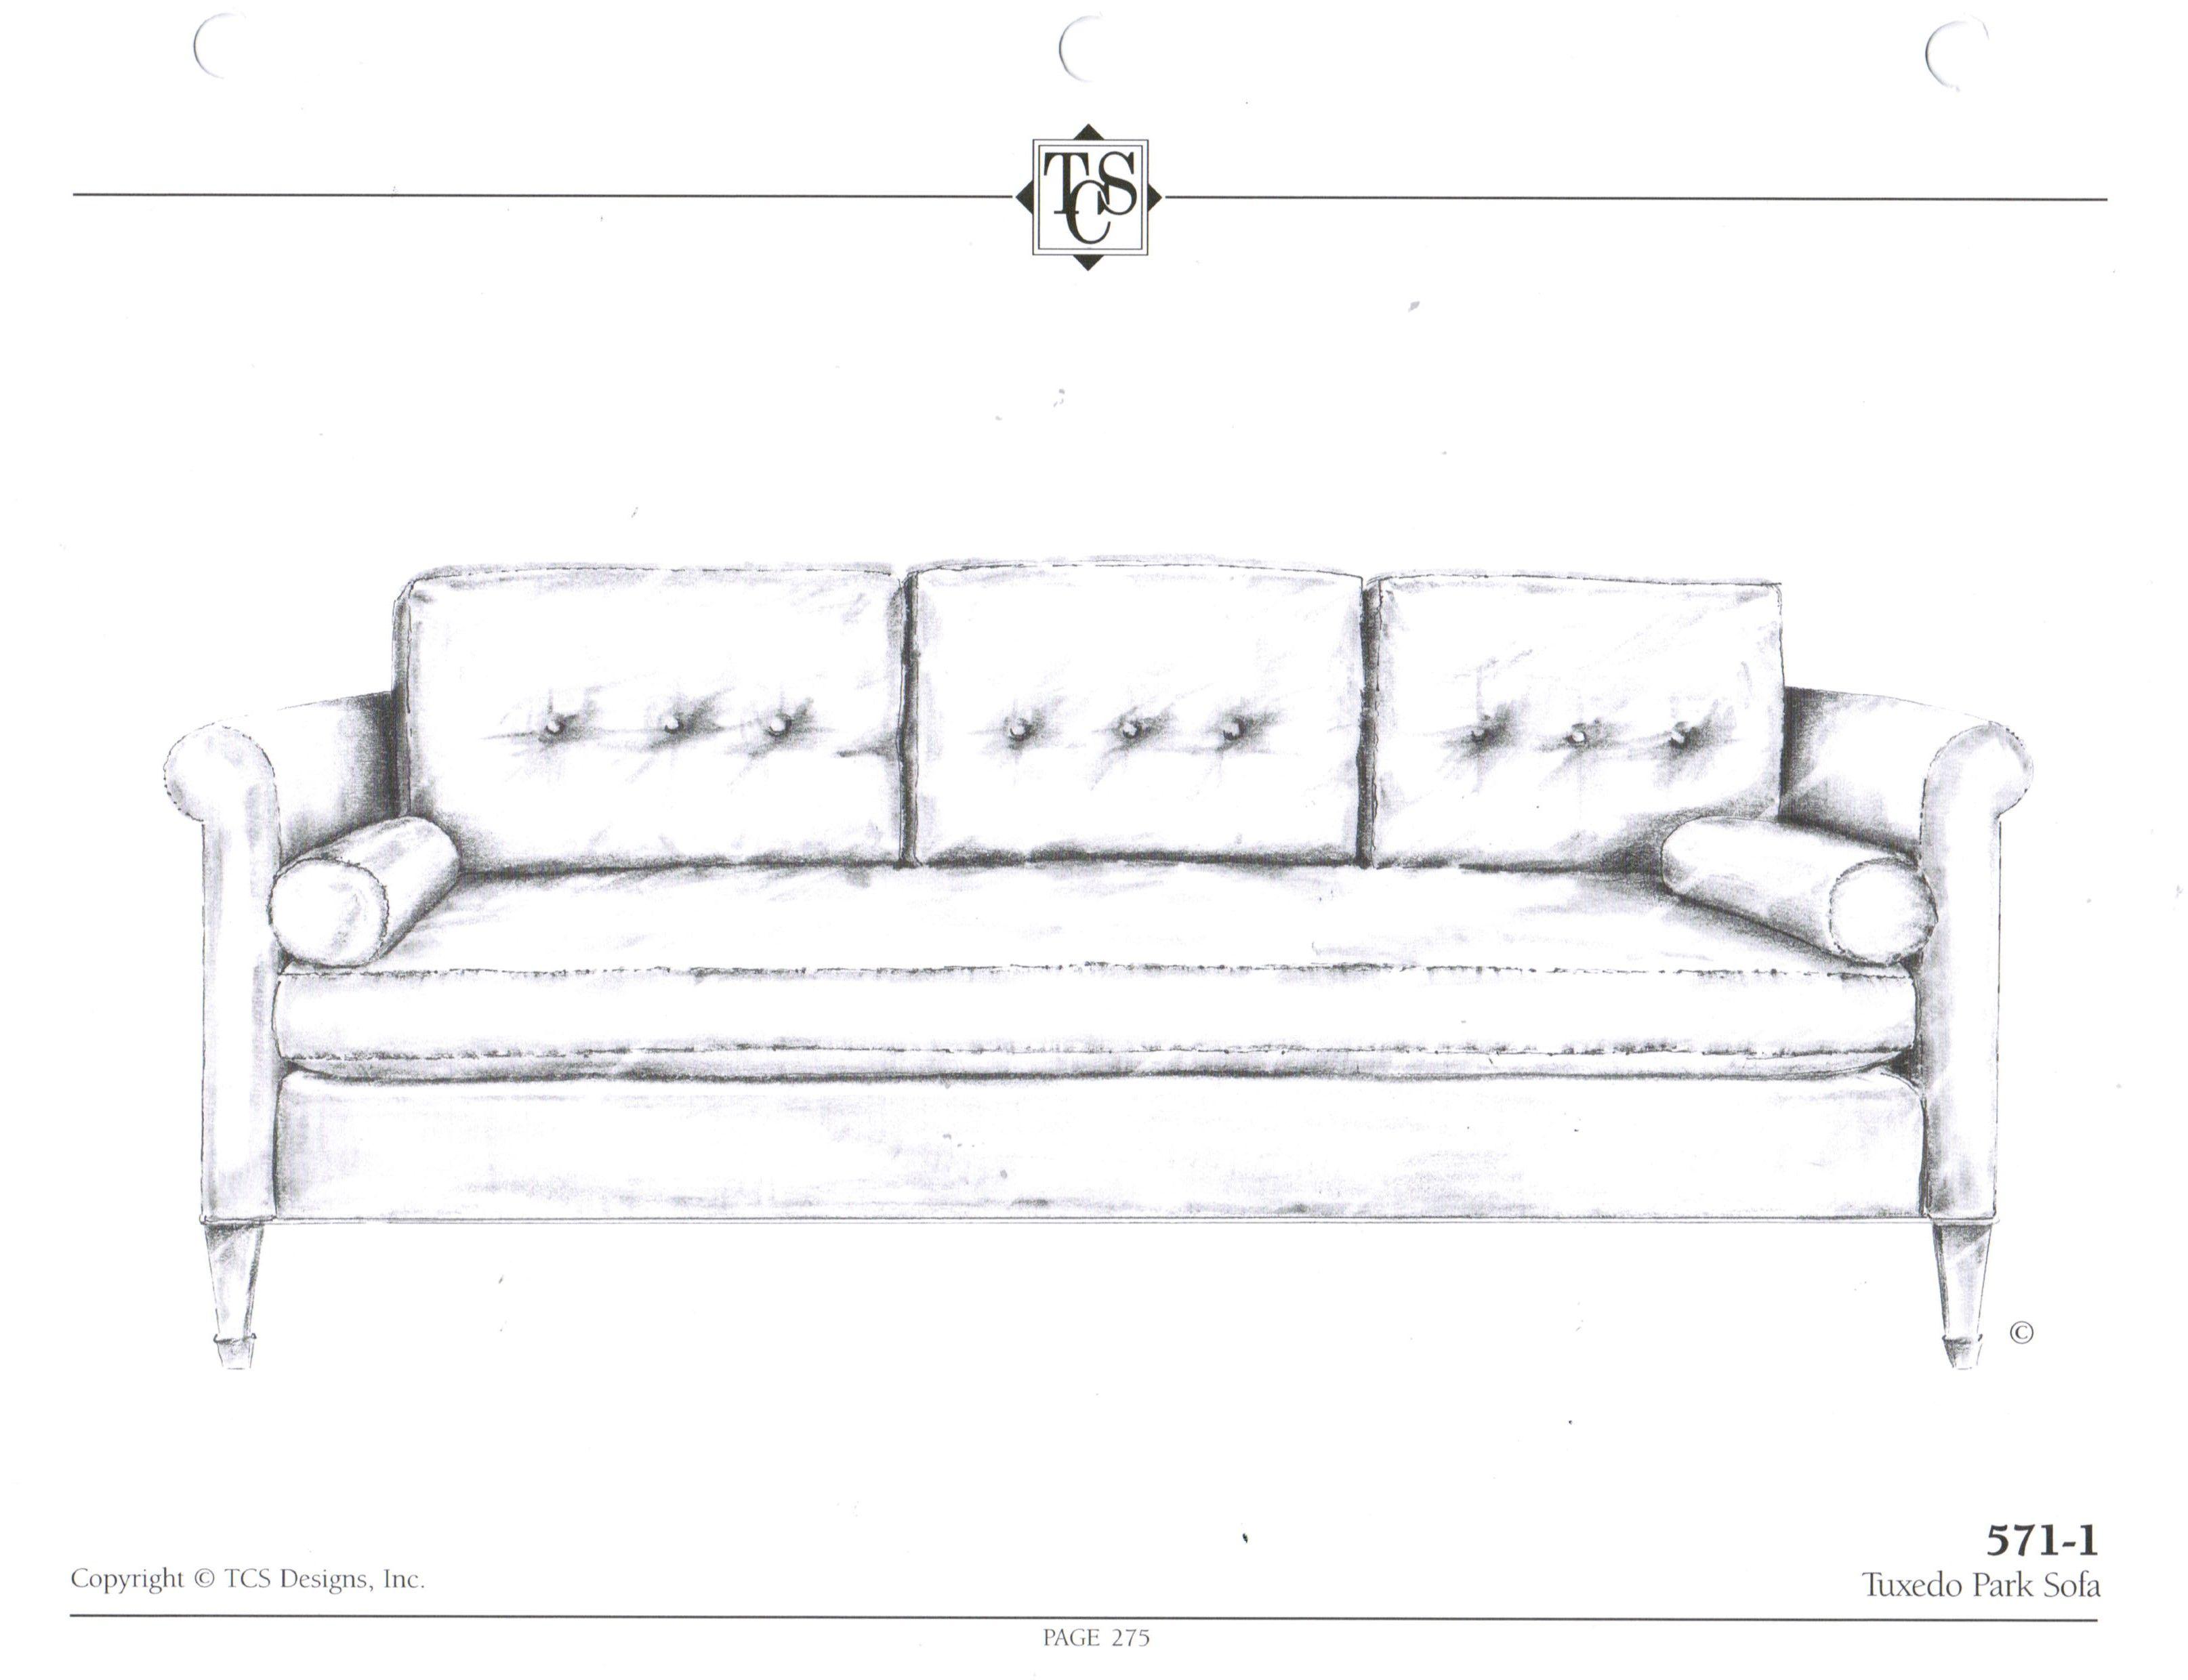 TCS - 571-1 Tuxedo Park Sofa Standard Size: 82